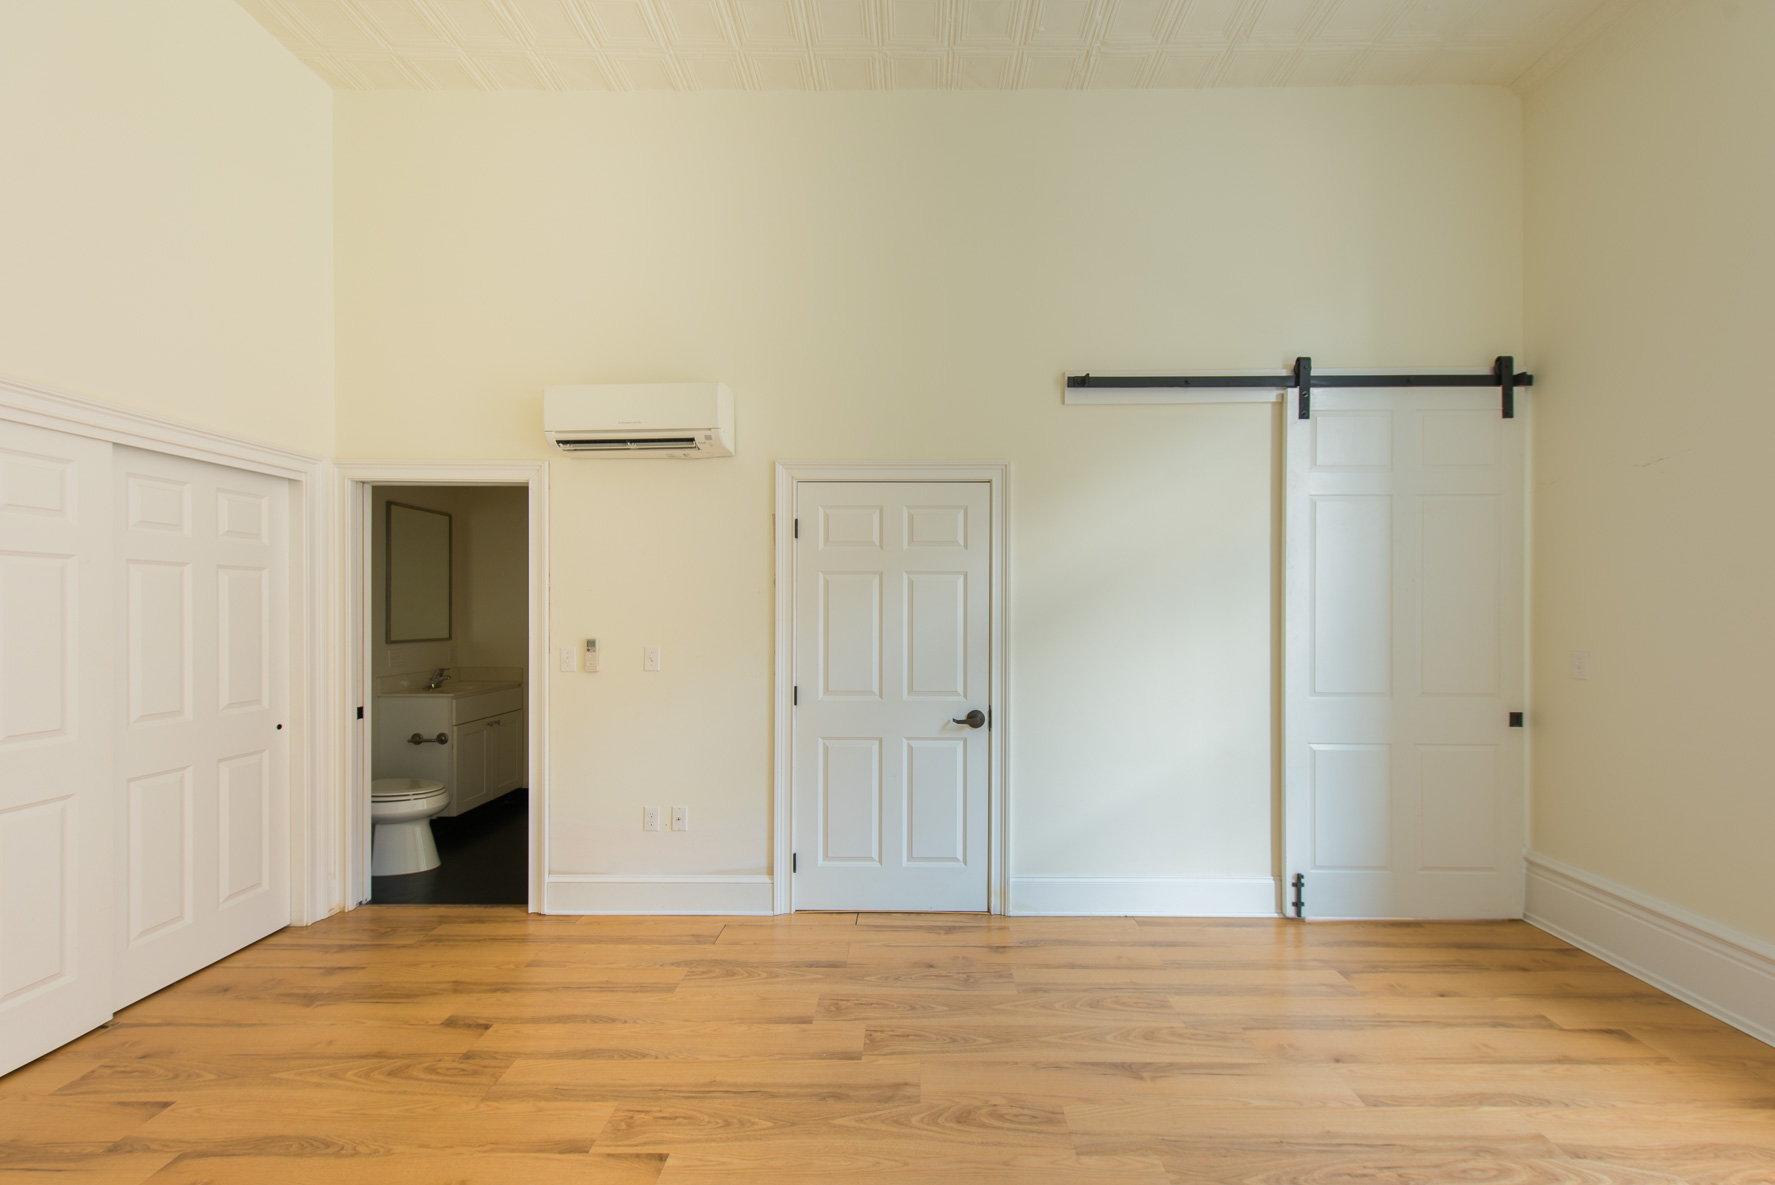 426 MKT Apartment Homes in Wilmington, Delaware